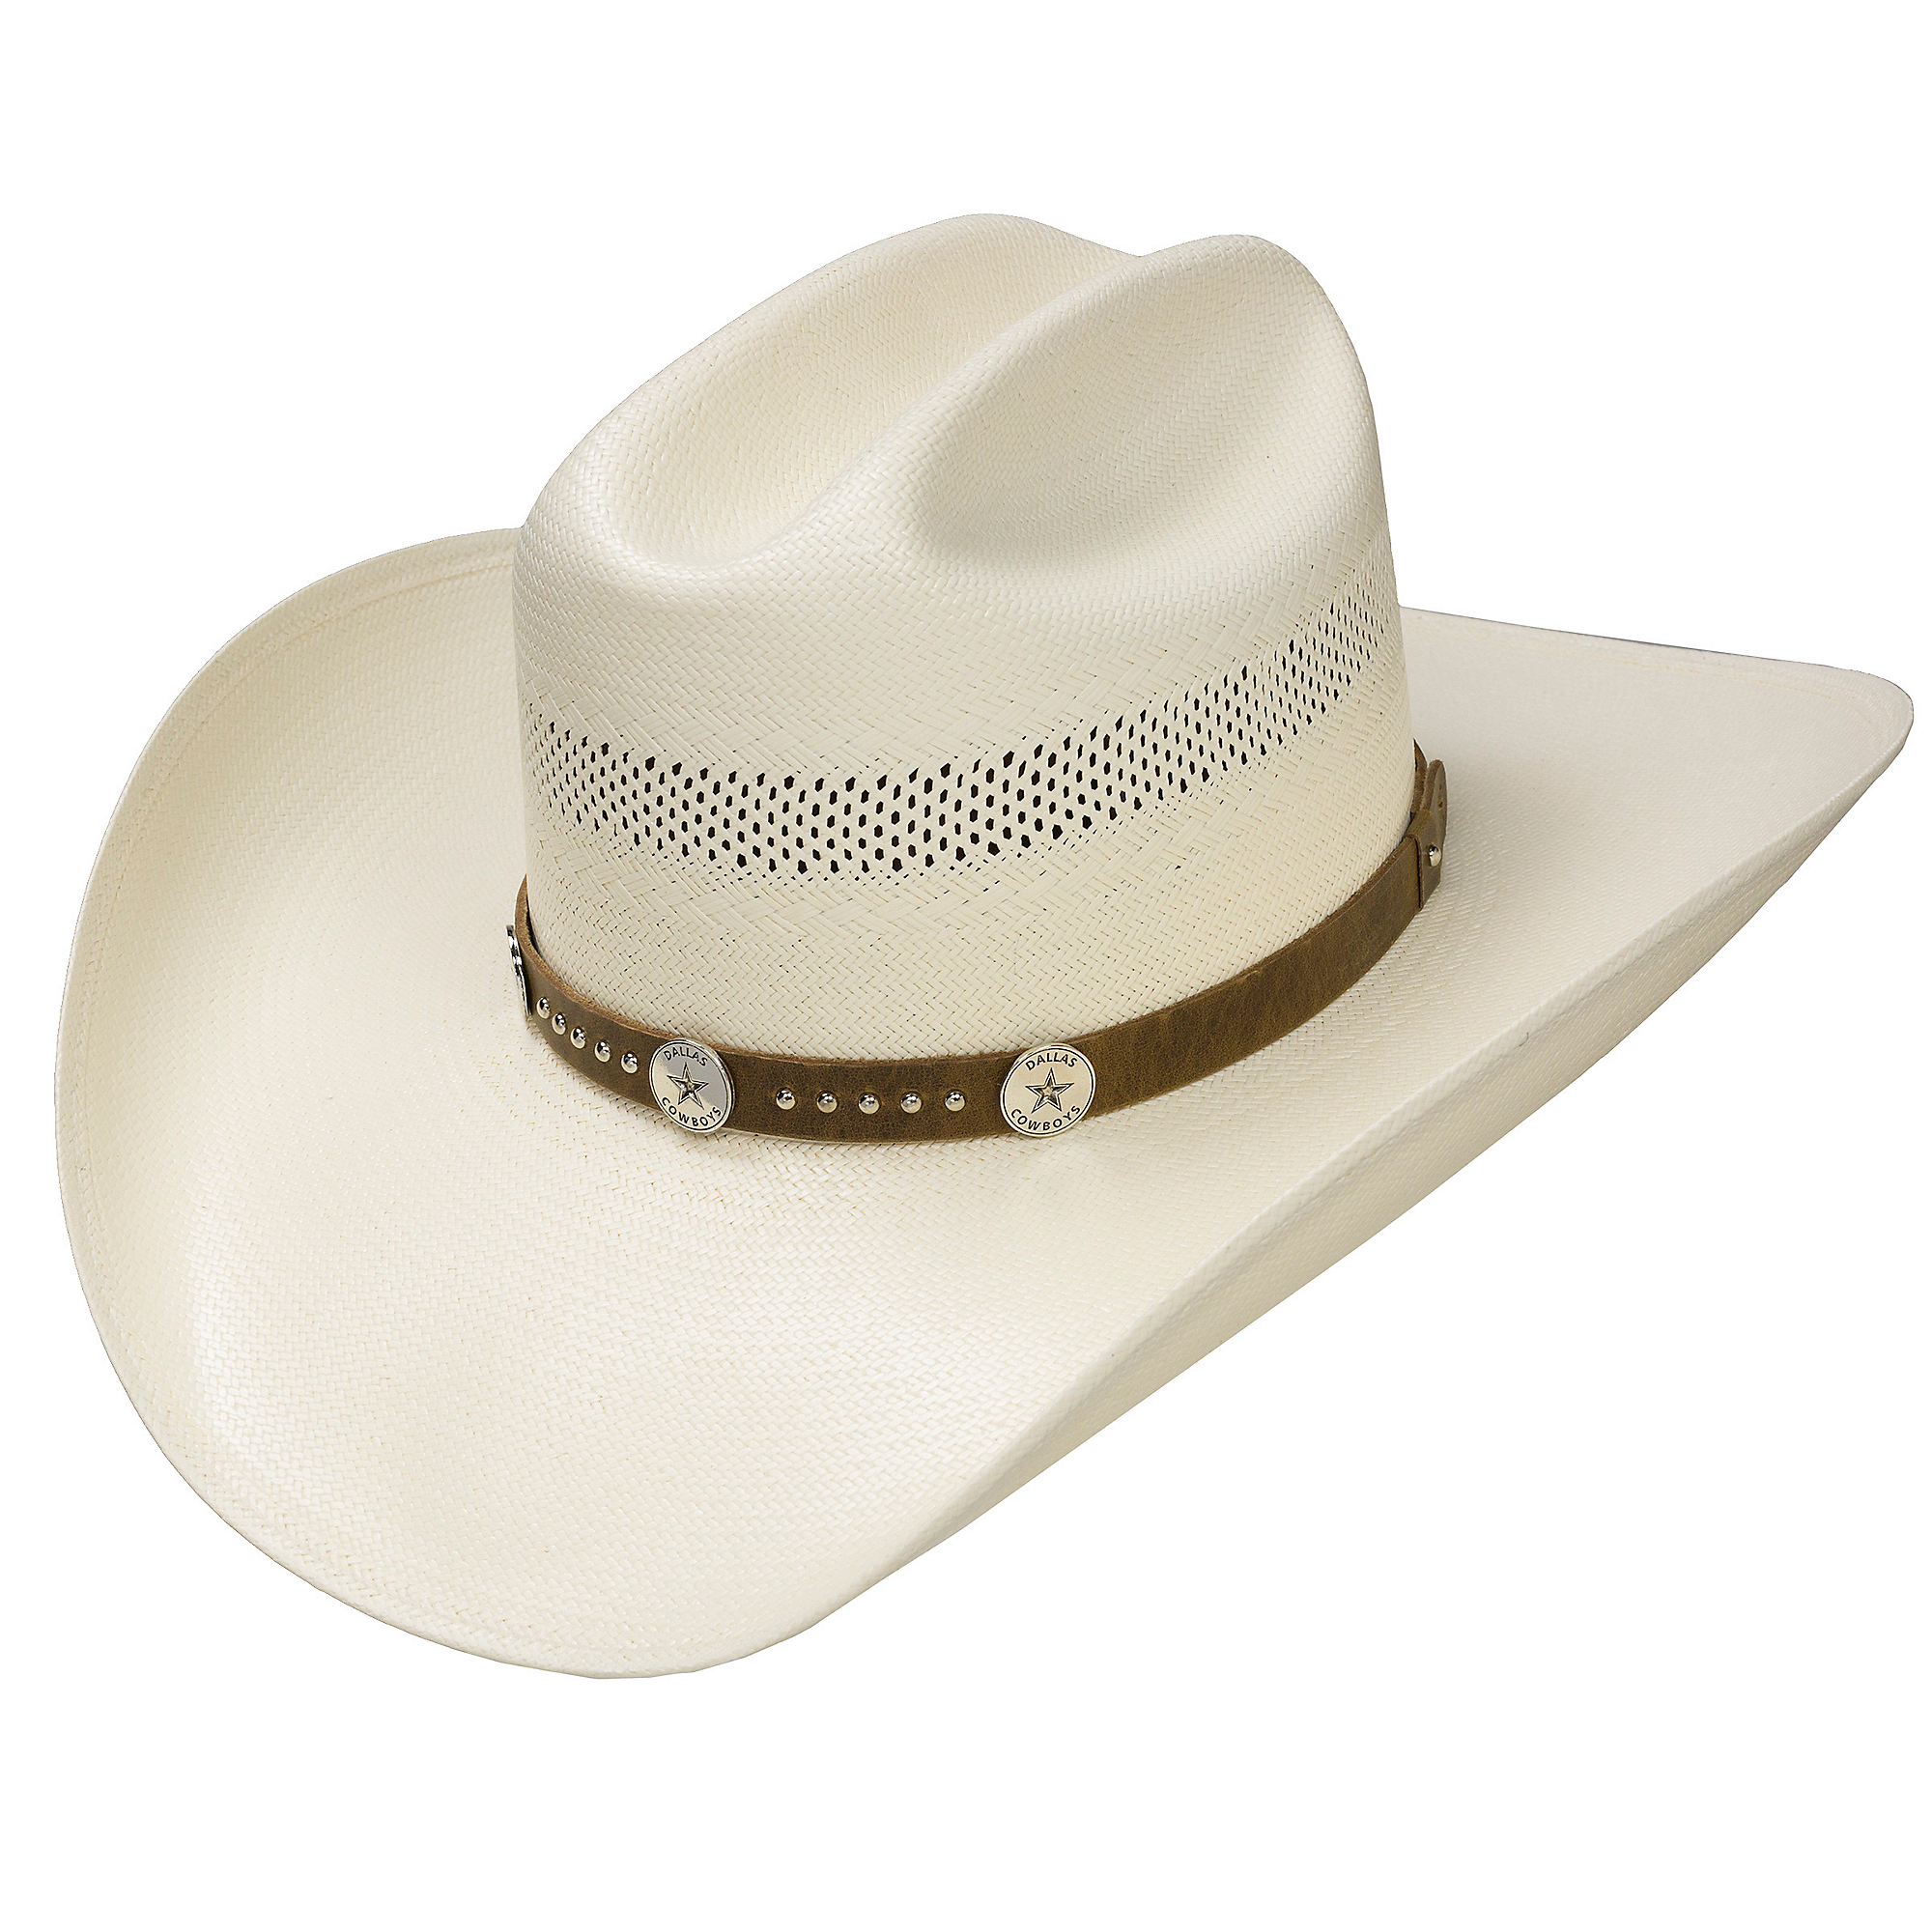 09419d5be Custom Straw Western Hats